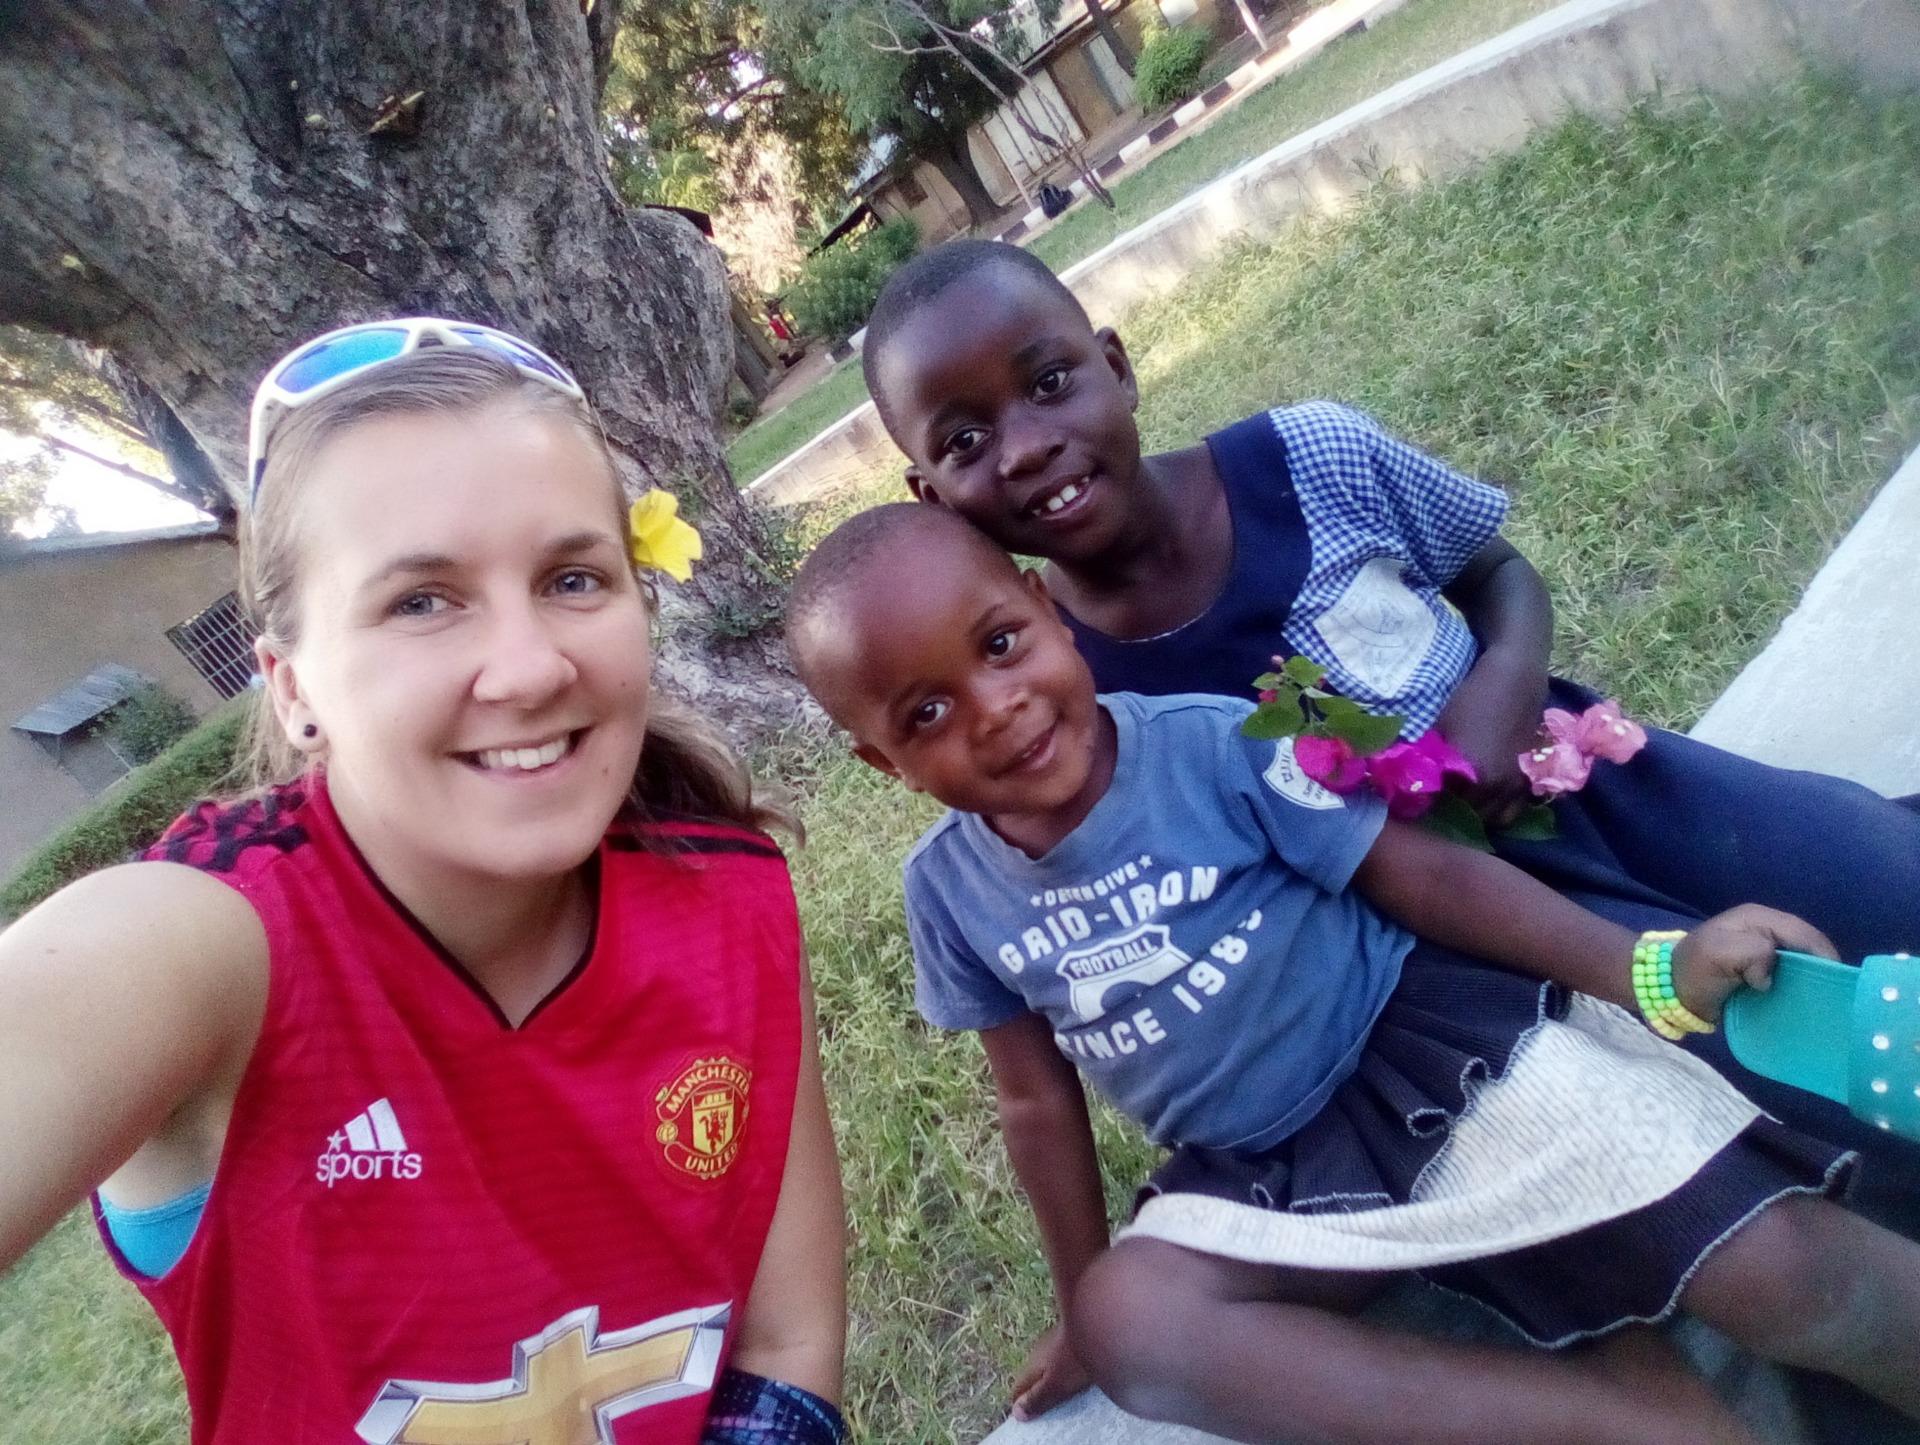 Sbalit motyku, smeták a matraci a vyrazit do školy aneb nový školní rok v Tanzánii